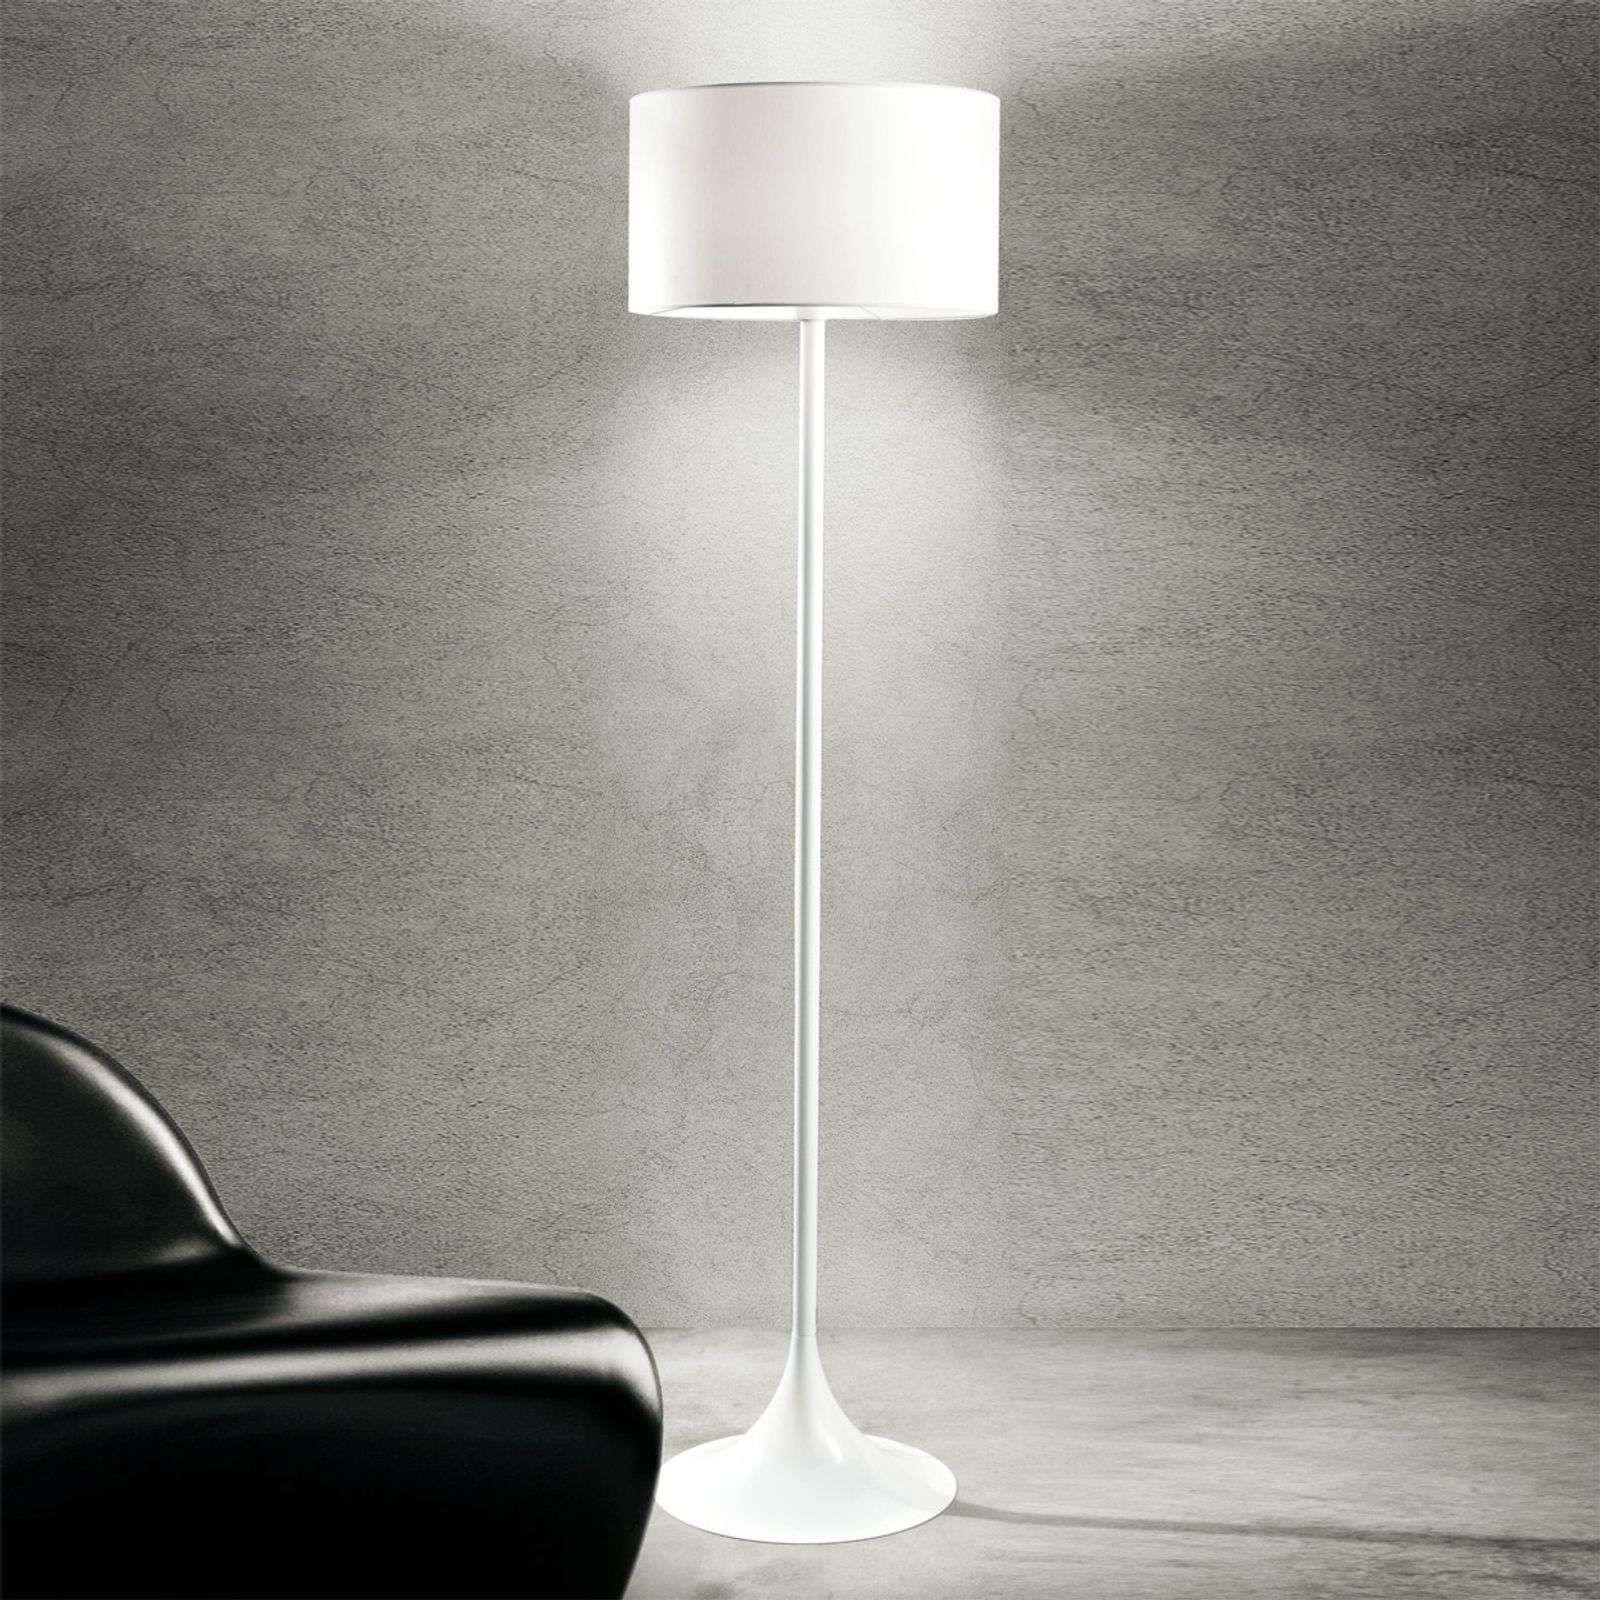 Tijdloze Vloerlamp Flute Stehlampe Mit Schirm Stehlampe Lampen